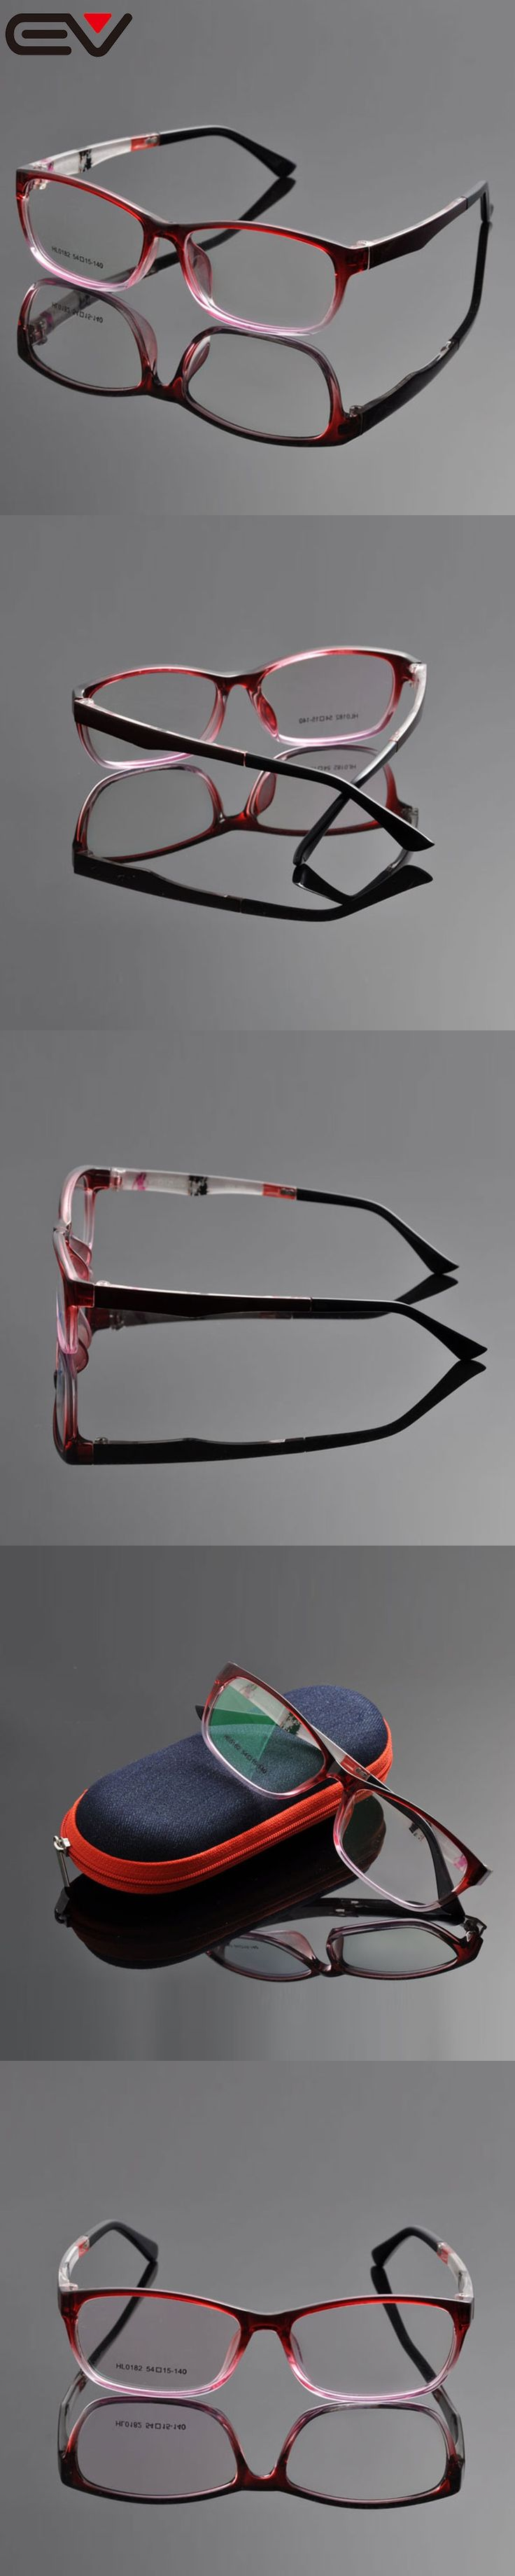 New eyeglasses frames men lentes opticos  optical glasses fashionable eyeglass frames monturas de gafas vintage spectacle EV1086